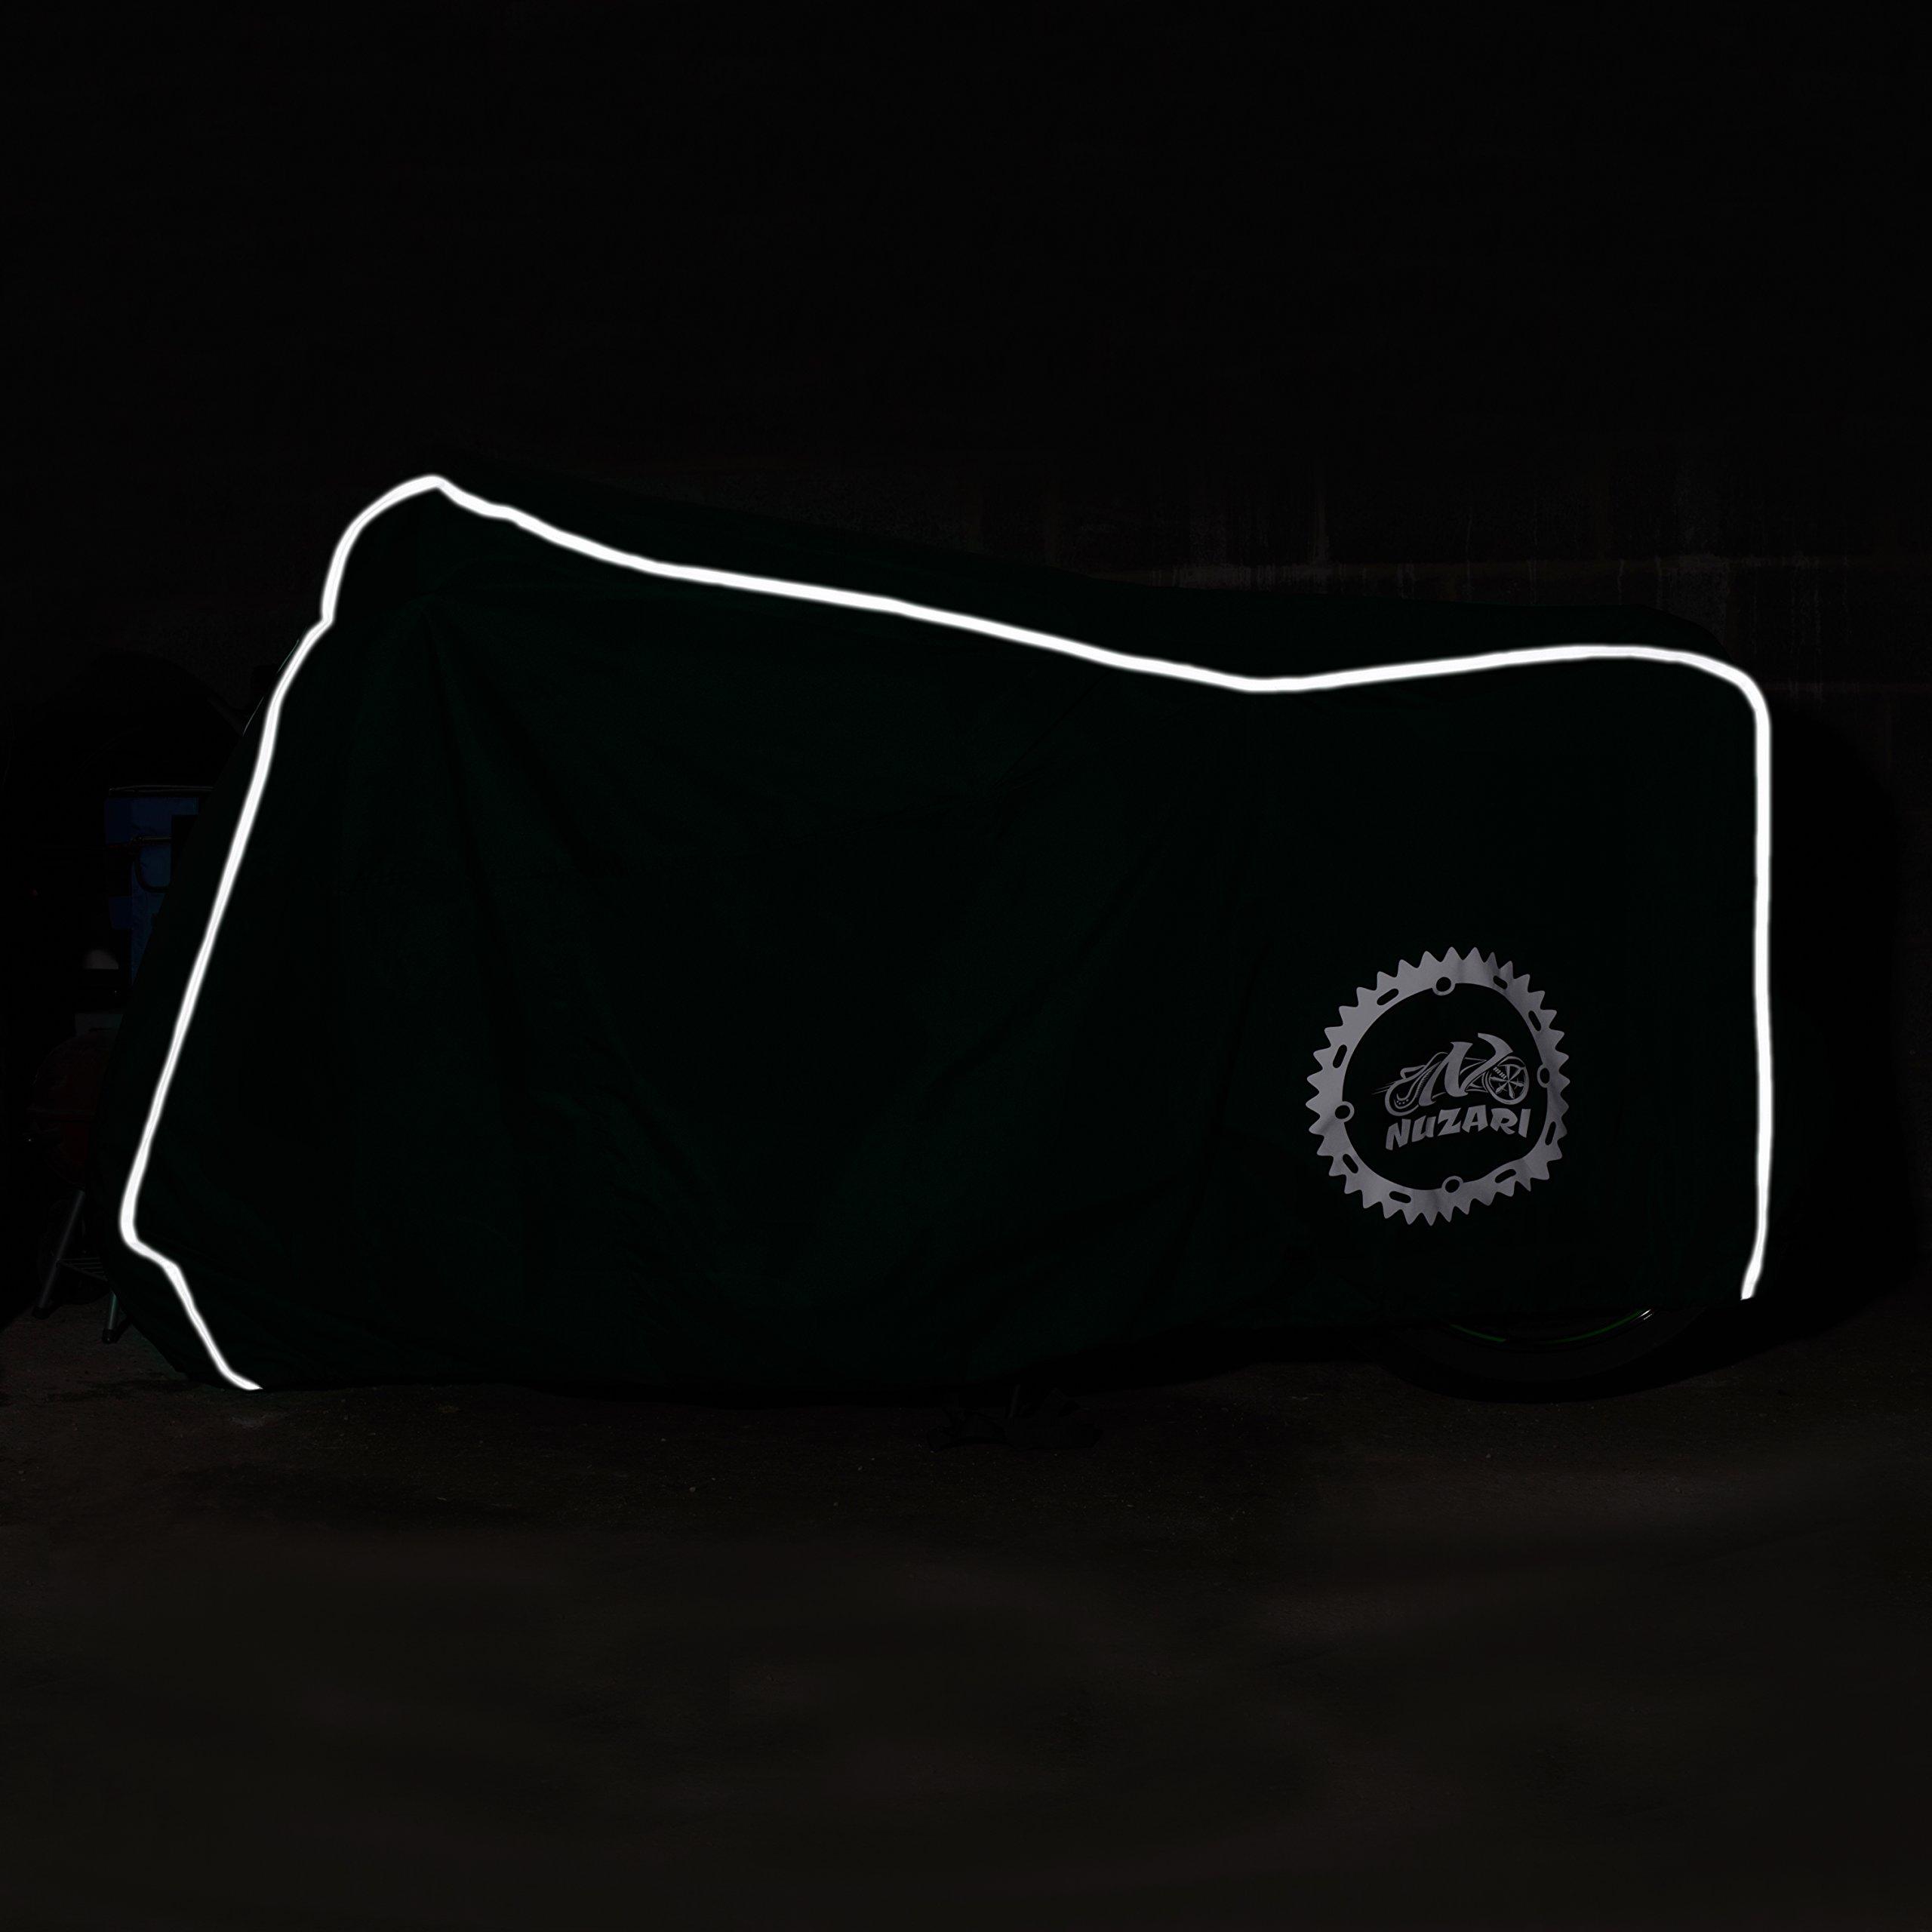 Premium Grade Weather Resistant Motorcycle Covers. Waterproof High Grade Polyester w/Soft Screen & Heat Resistant Shield Lockable fabric, Durable & Long Lasting. Sportbikes & Cruisers (medium black) by Nuzari (Image #4)